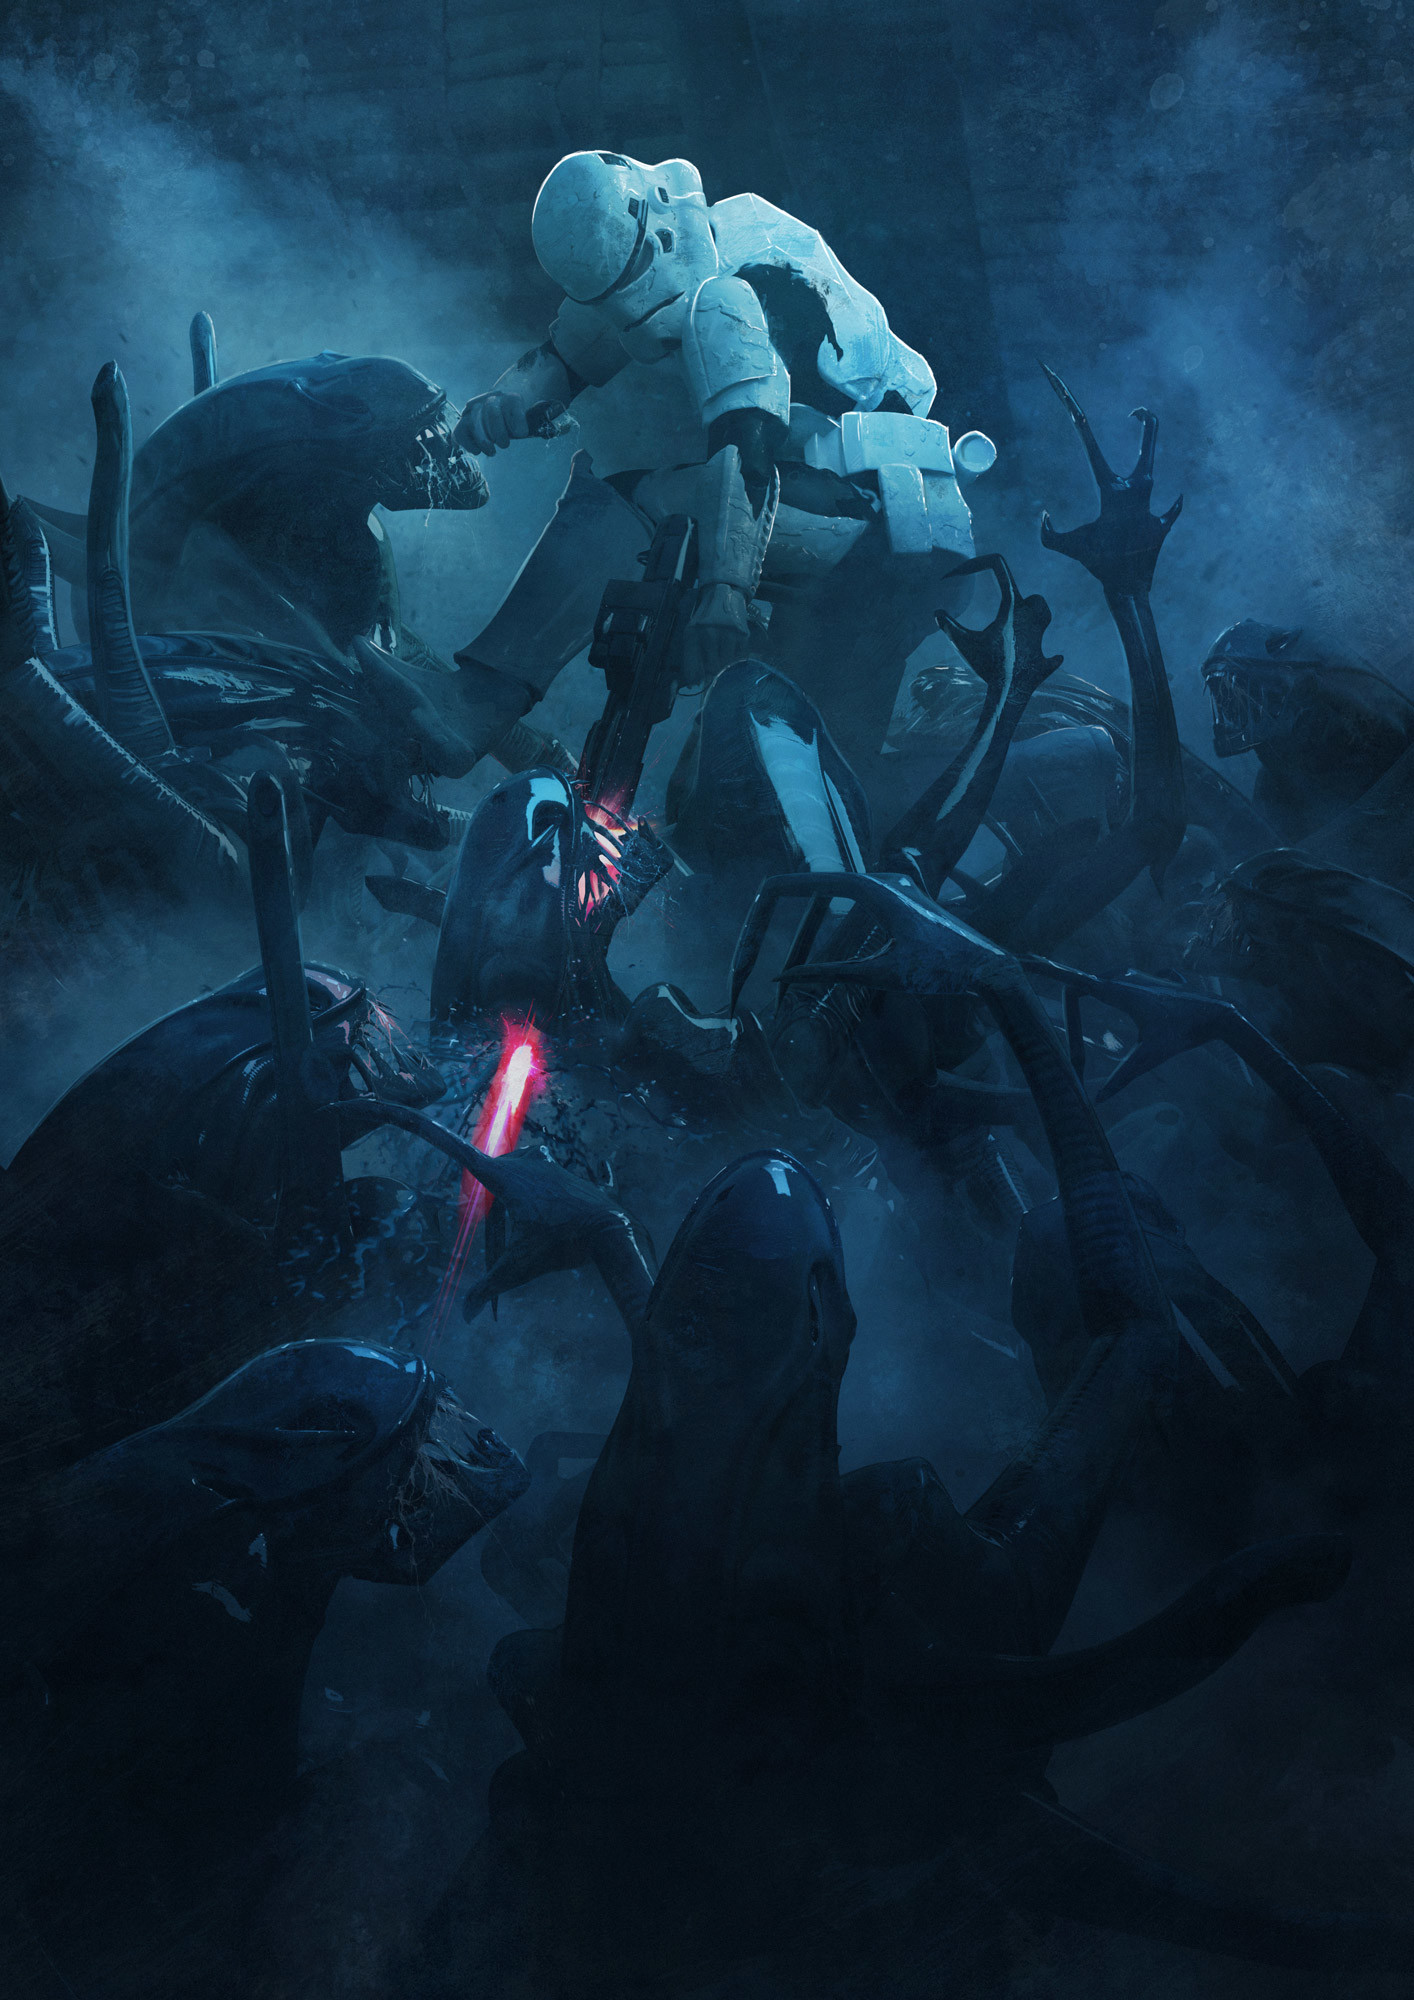 Guillem h pongiluppi guillemhp 501 legion stormtroopers vs aliens detail 1